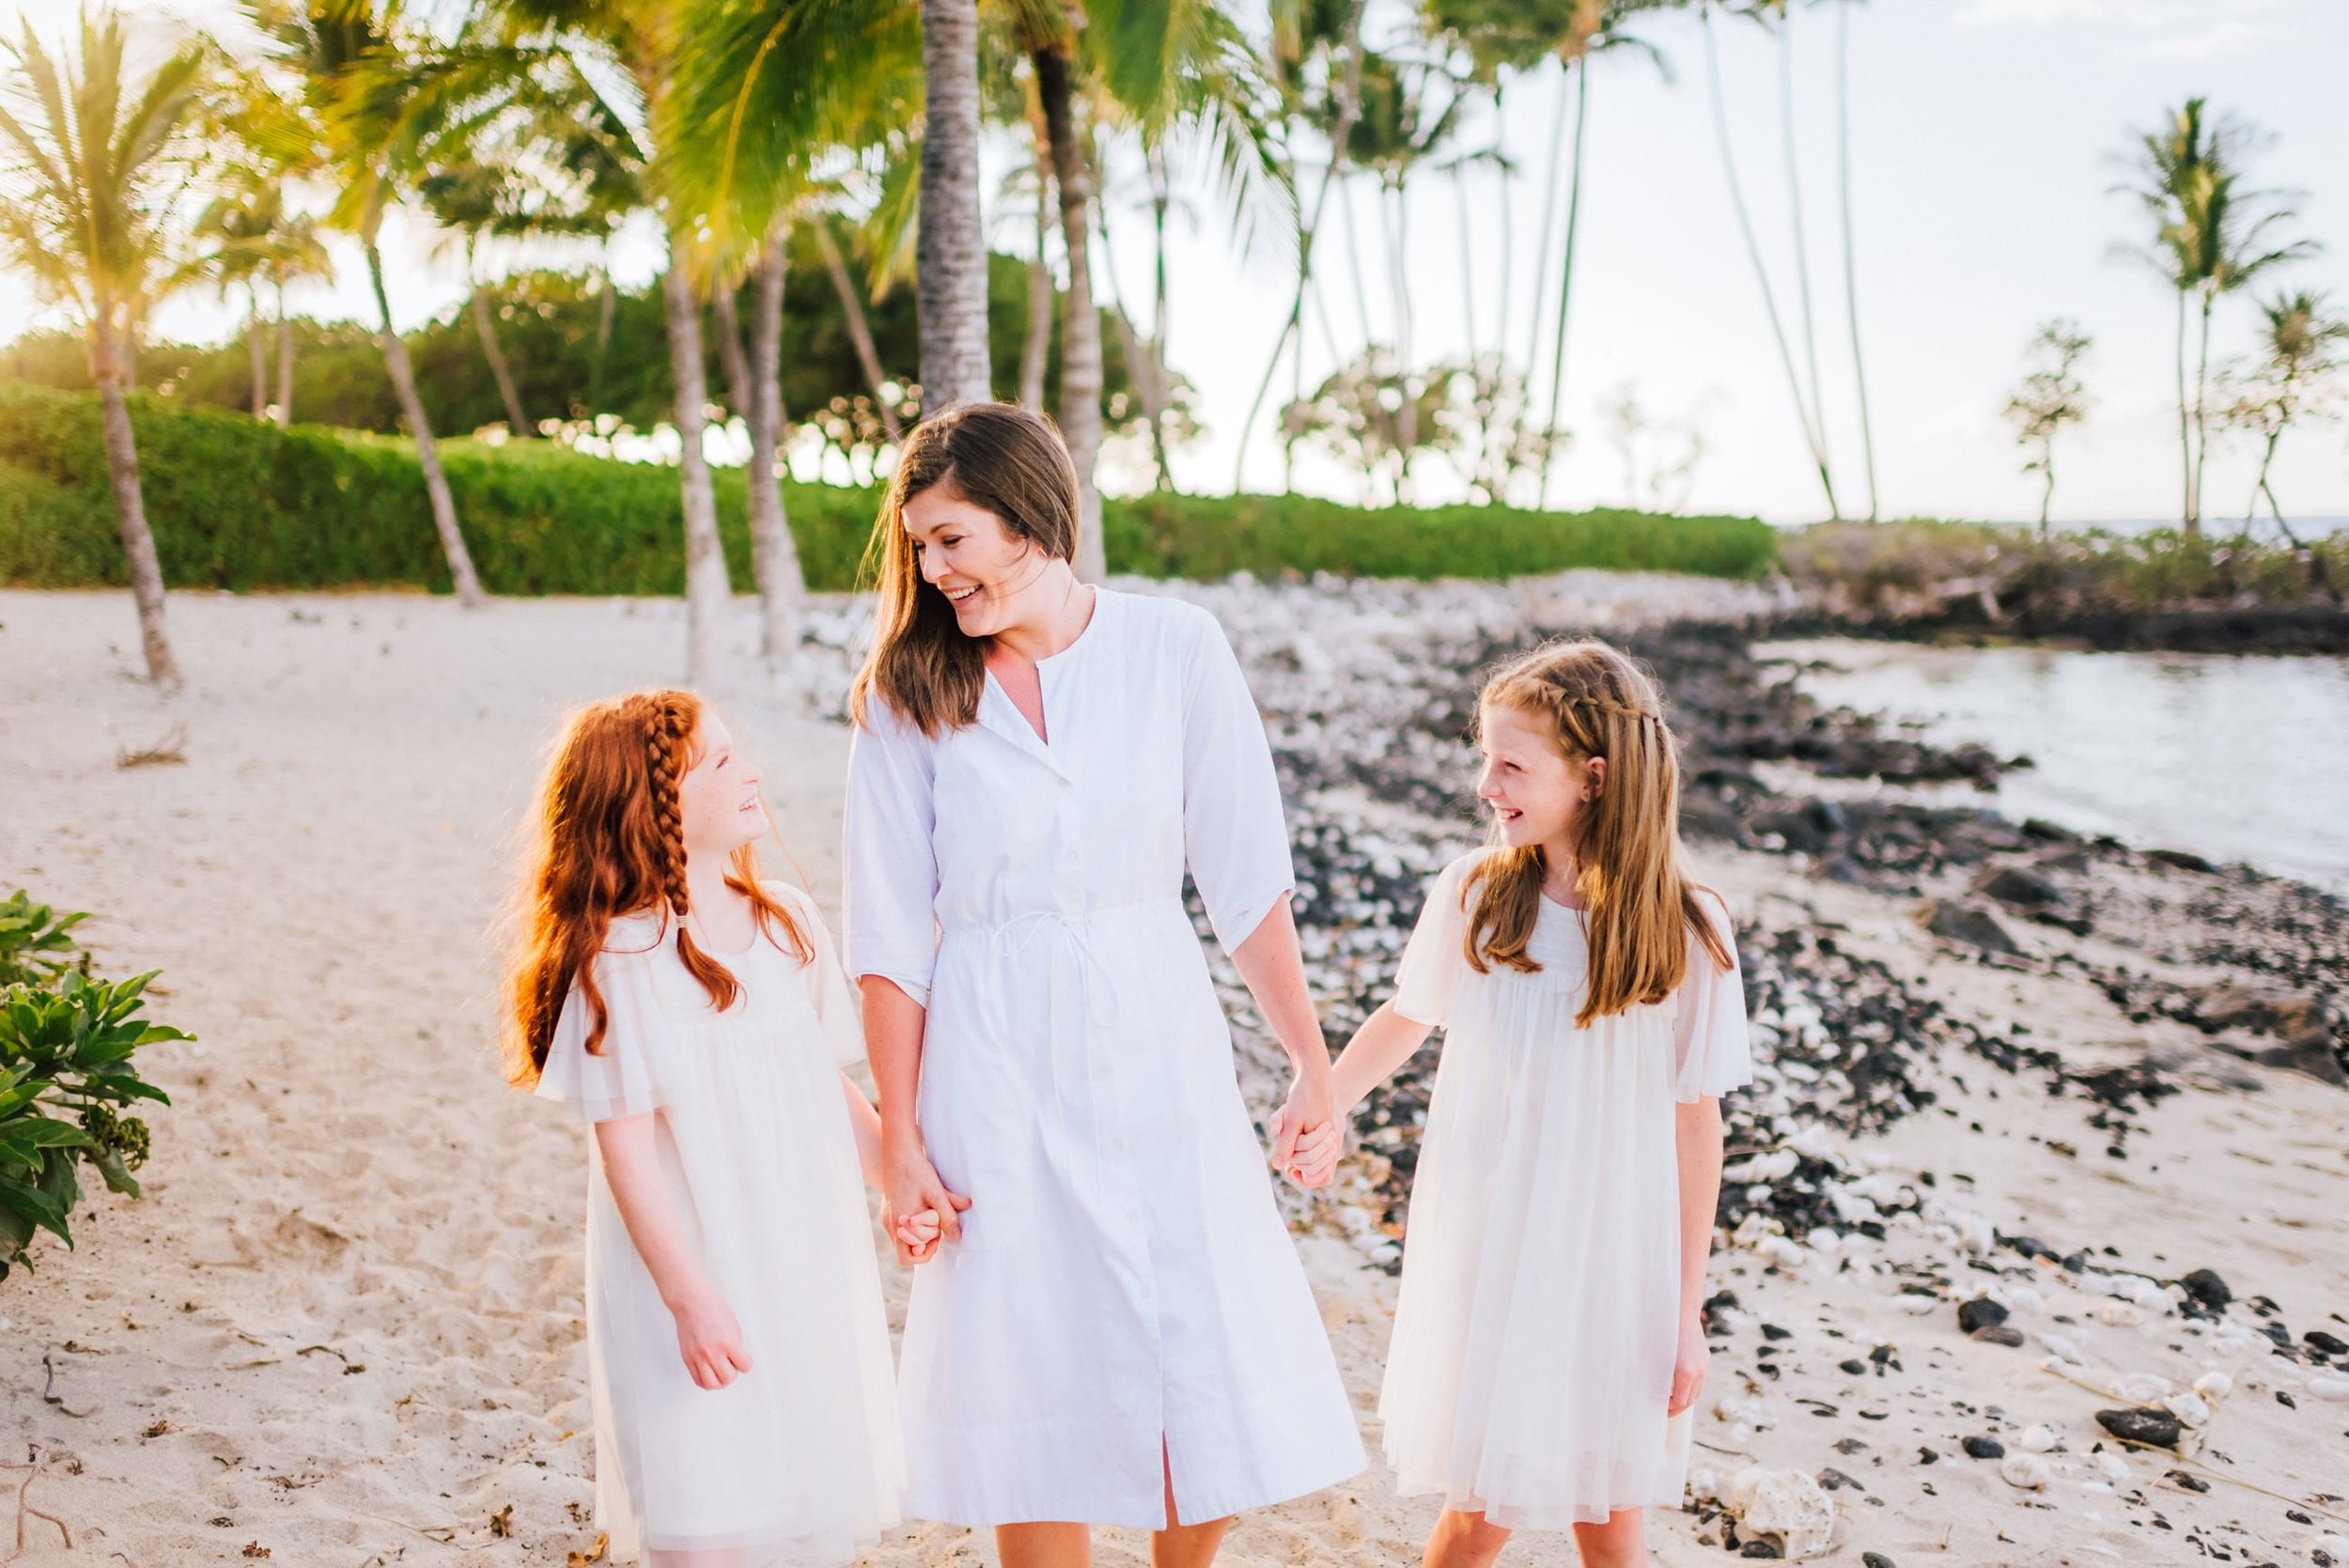 Hawaii-Family-Photographer-Waikoloa-Fairmont-Hualalai-Mauna-Kea-11.jpg